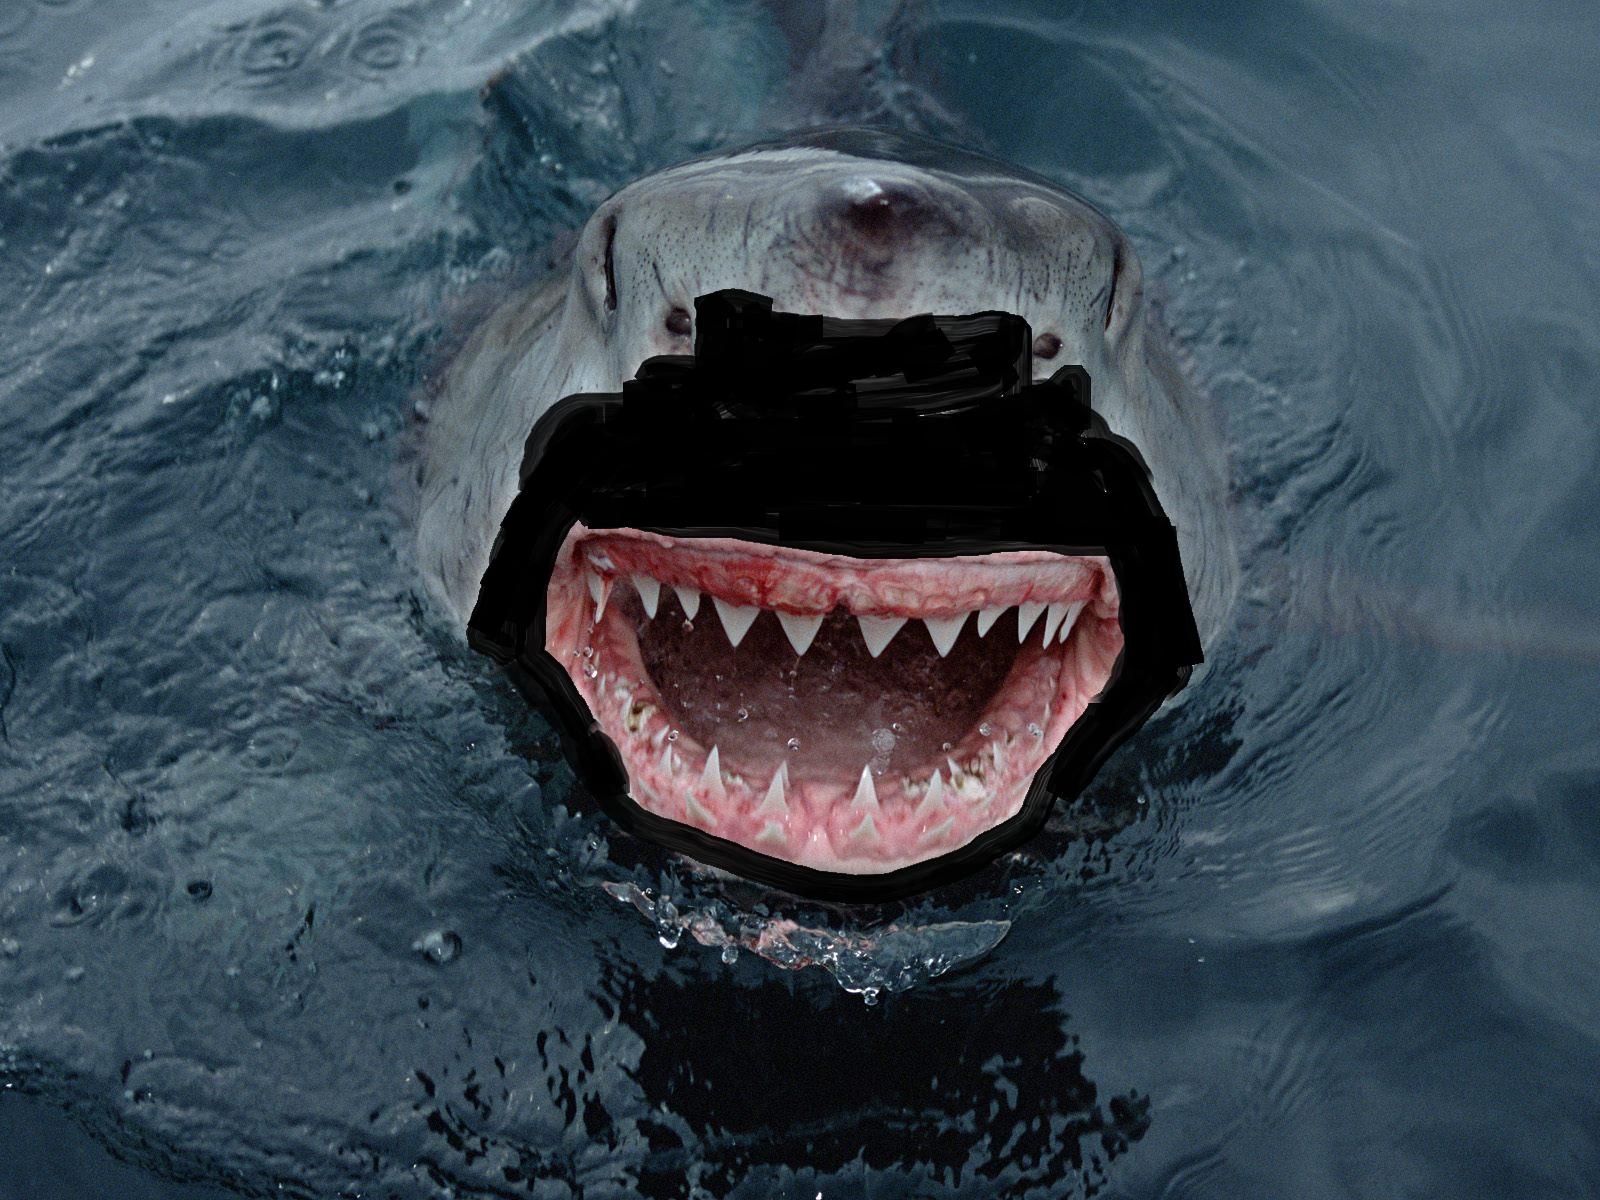 Great Black Shark The Zimmerman(n) Telegram